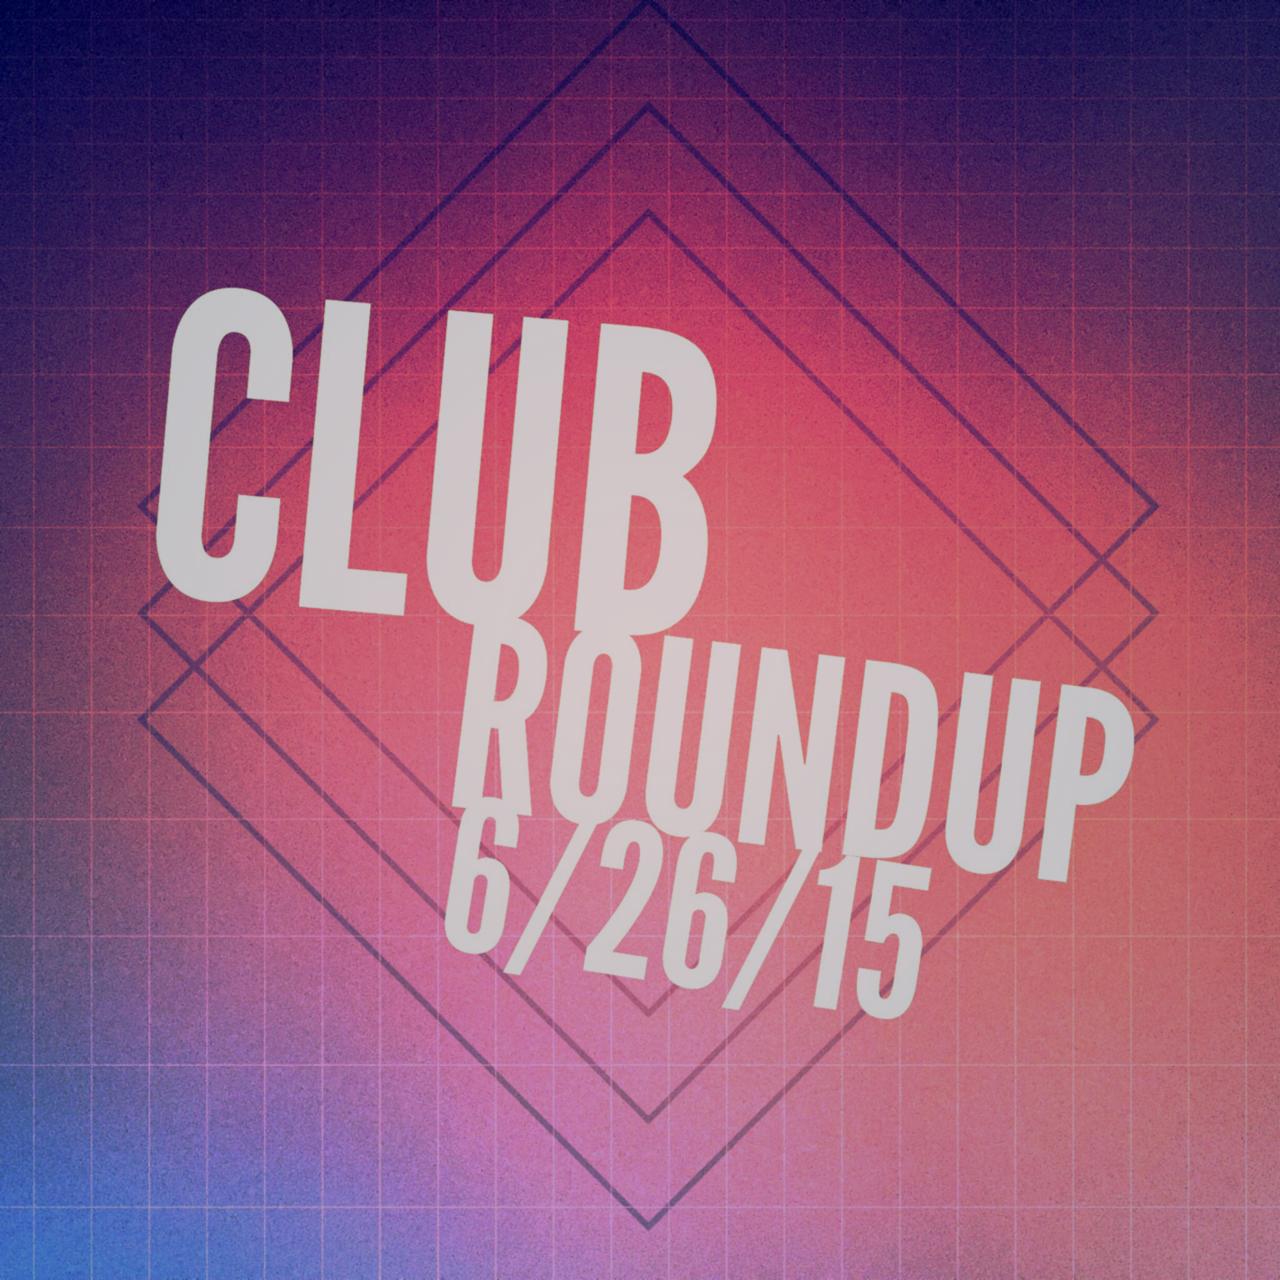 Club Roundup 6/26/15